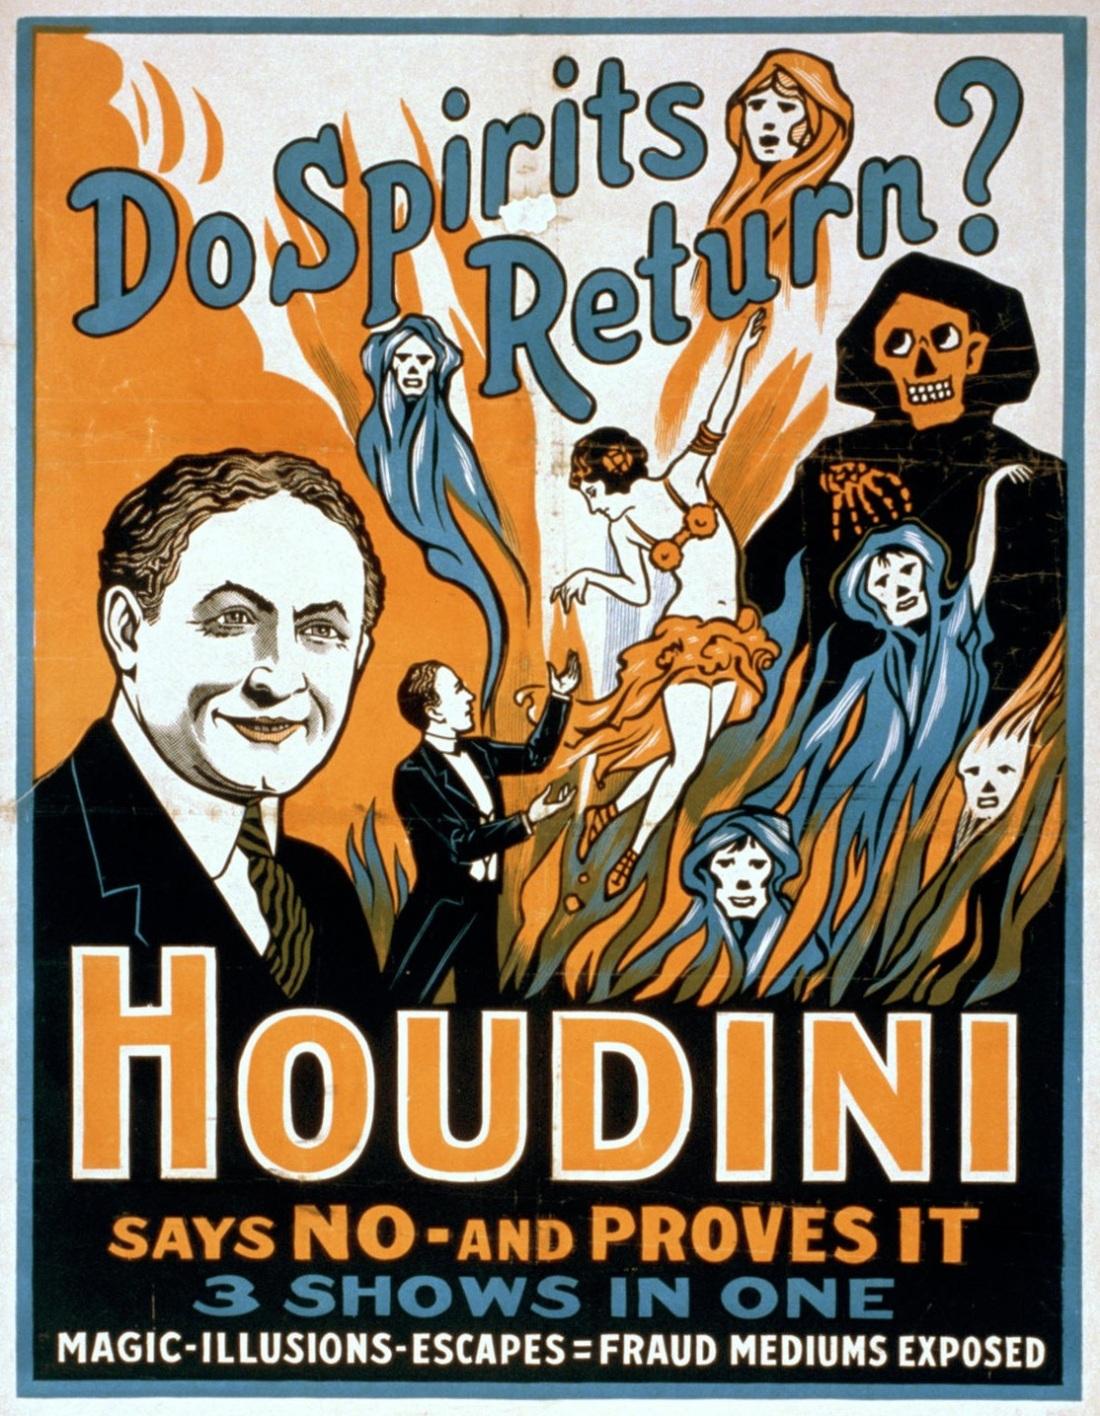 Houdini-poster